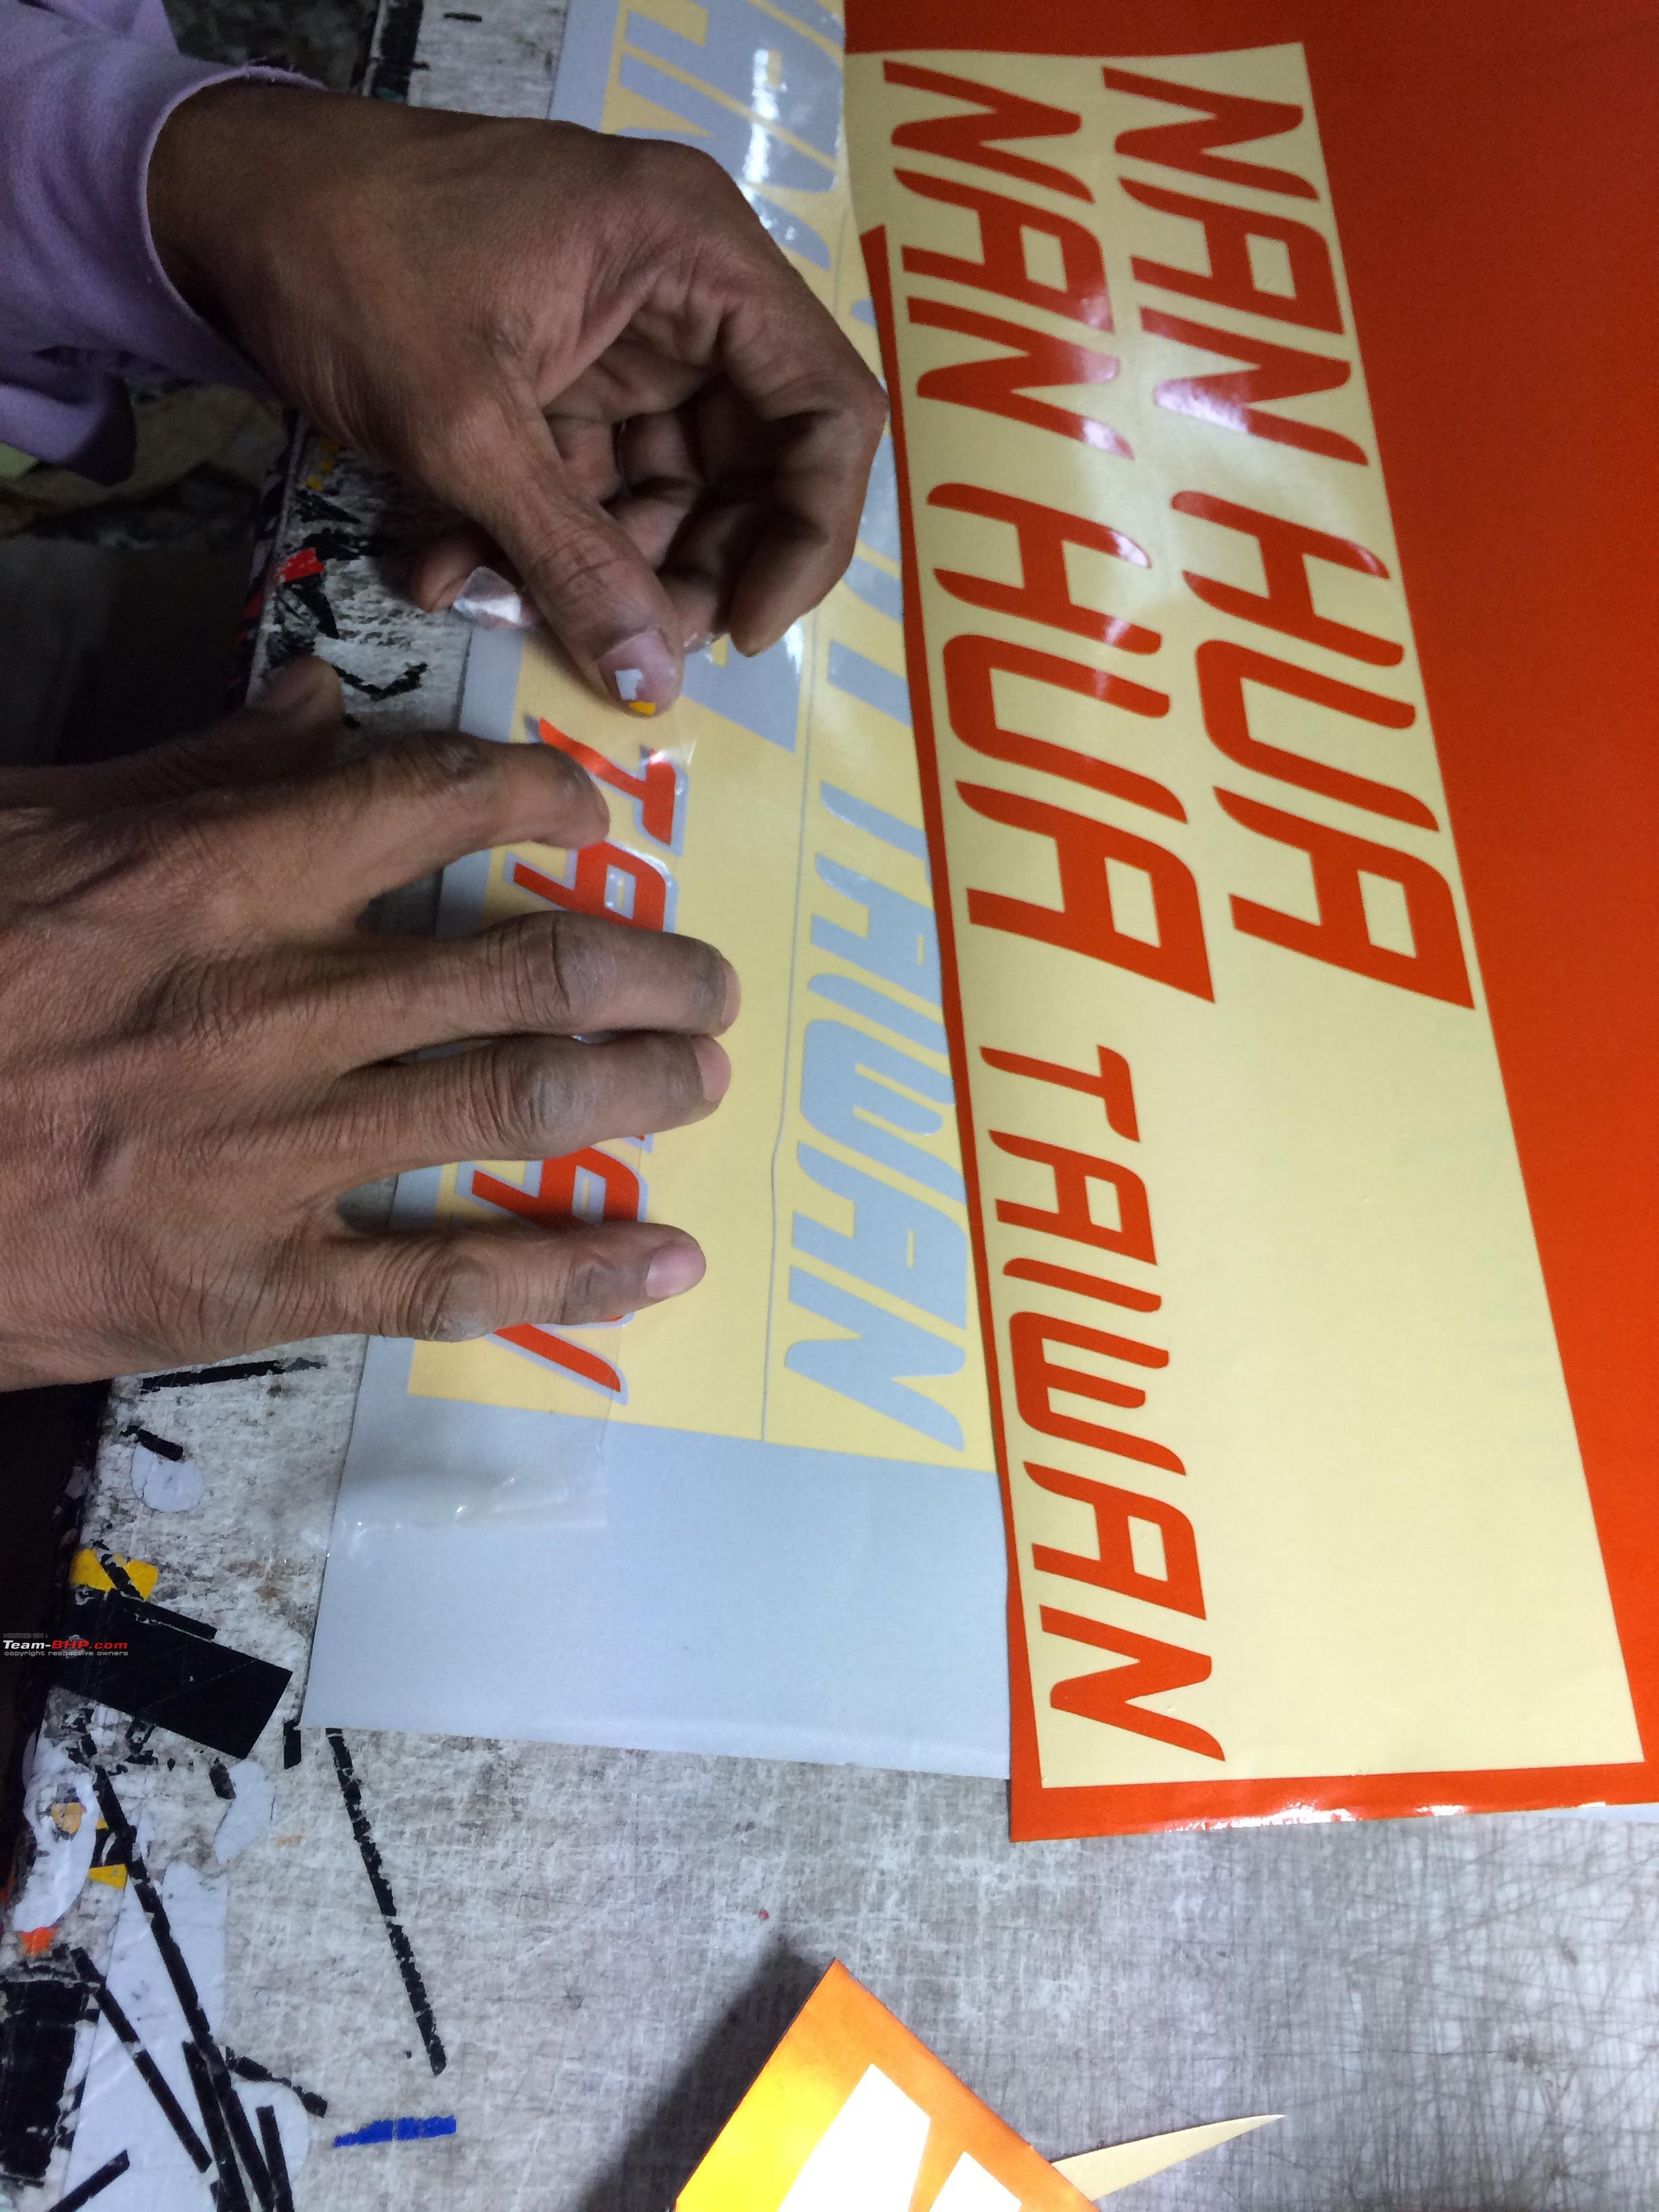 Car sticker maker in delhi - Number Plates And Stickers Tarun Cars Lajpat Nagar Delhi Photo